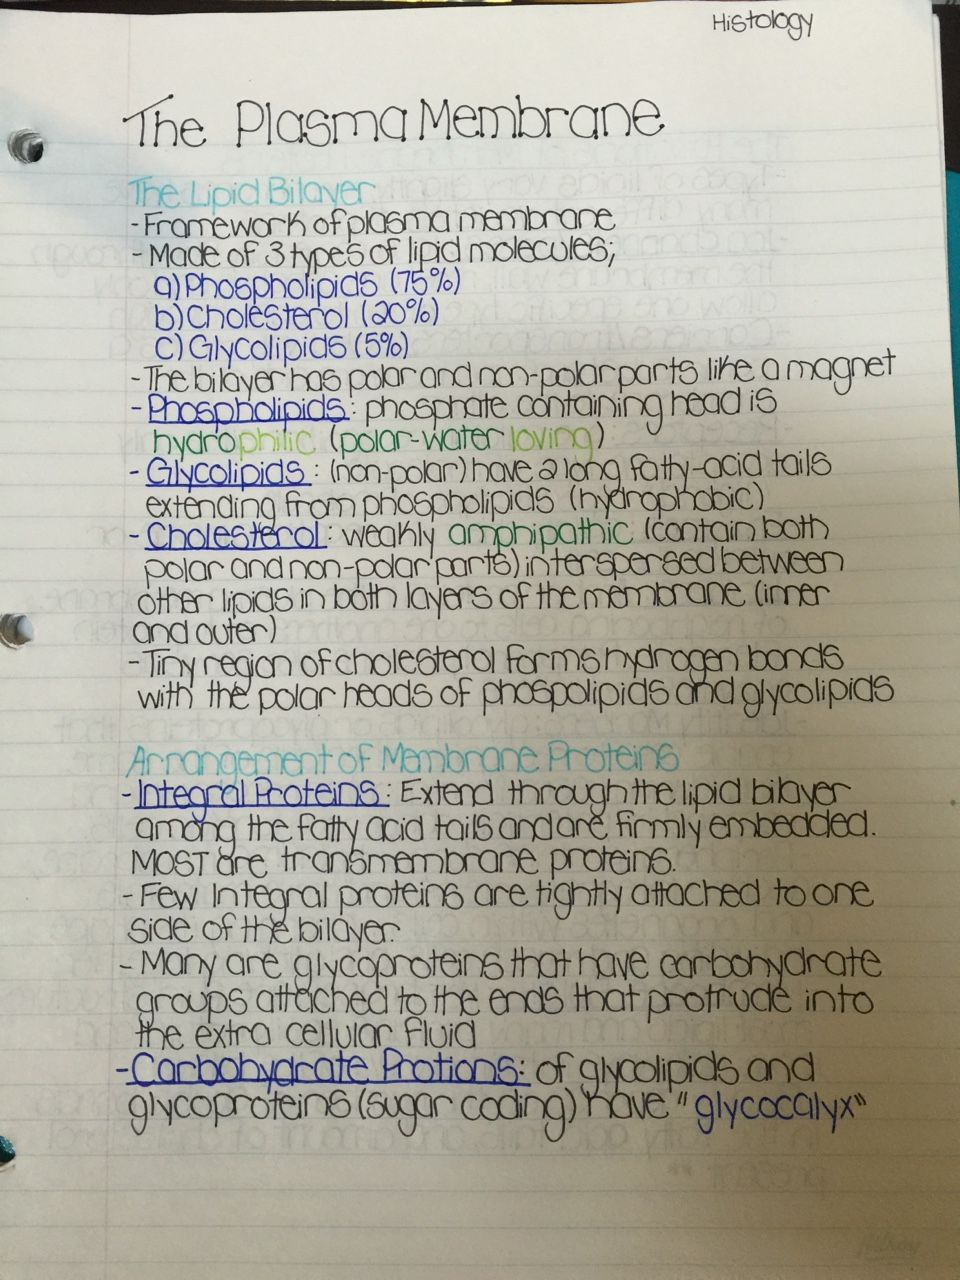 Handwritten Study Notes — Histology Course The Plasma